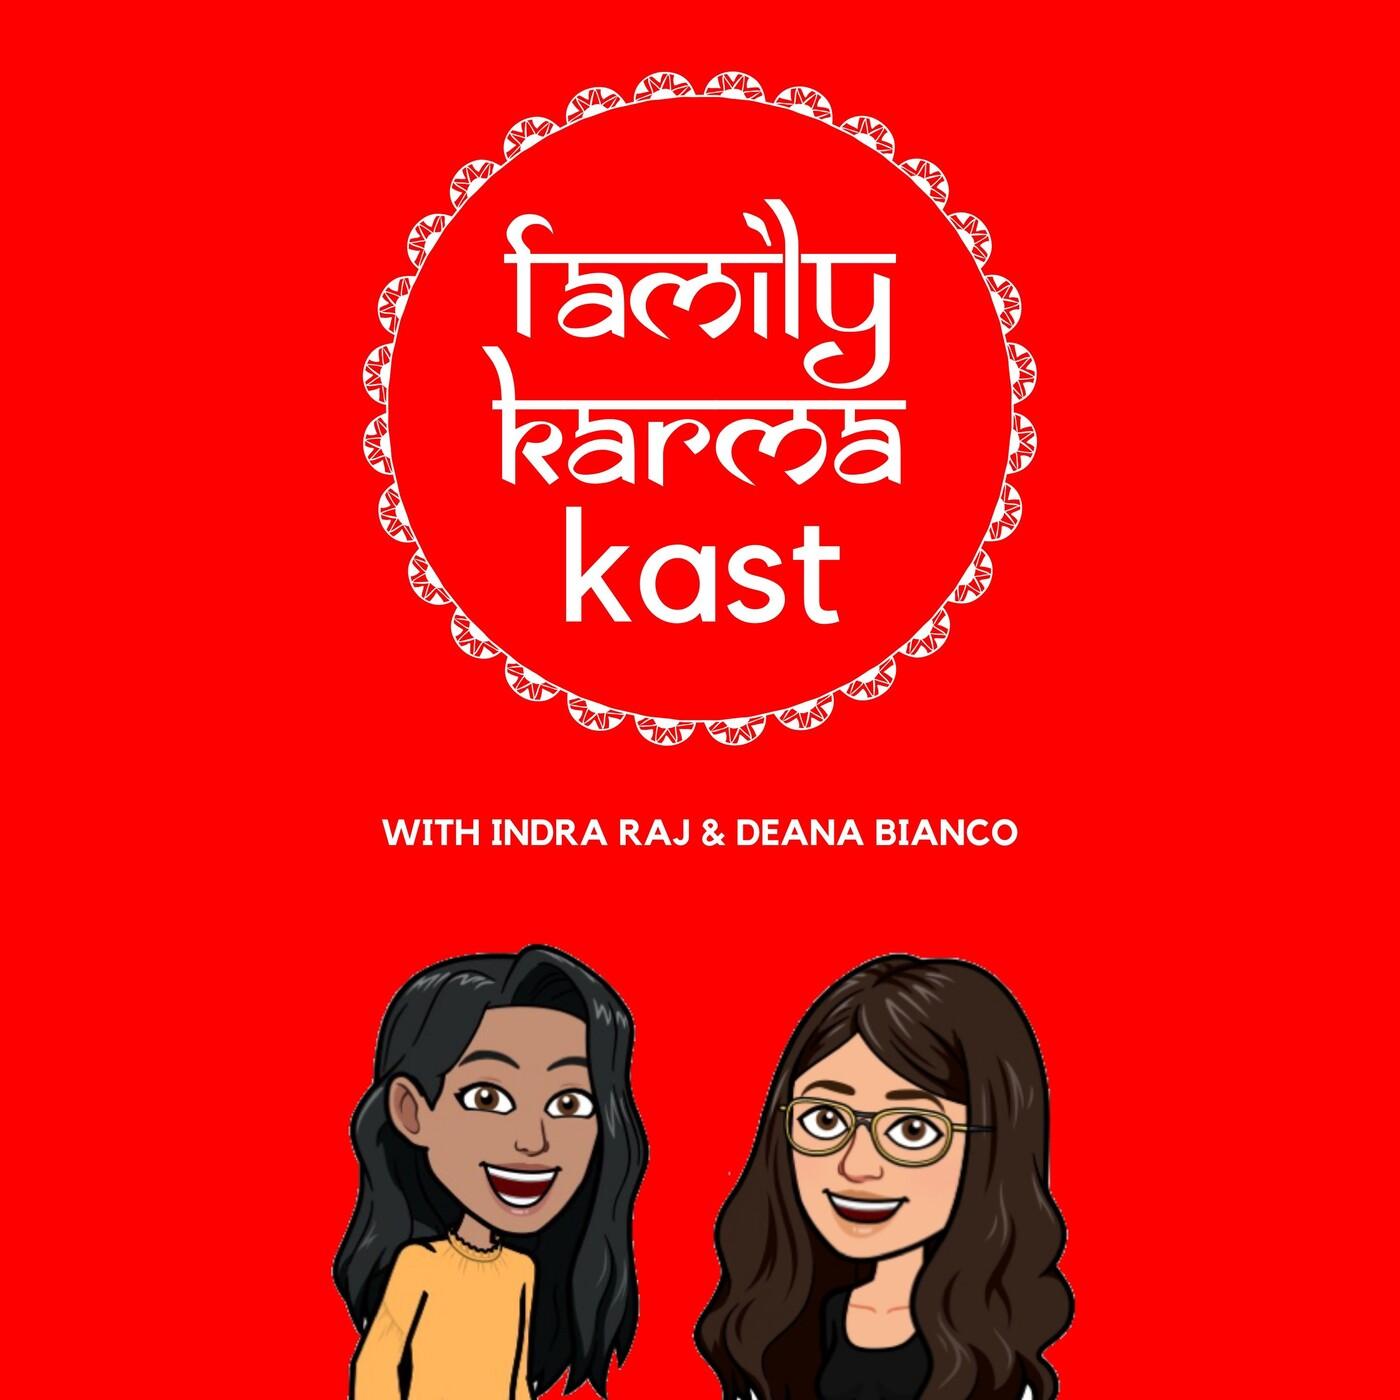 13. Family Karma Kast relaunch!